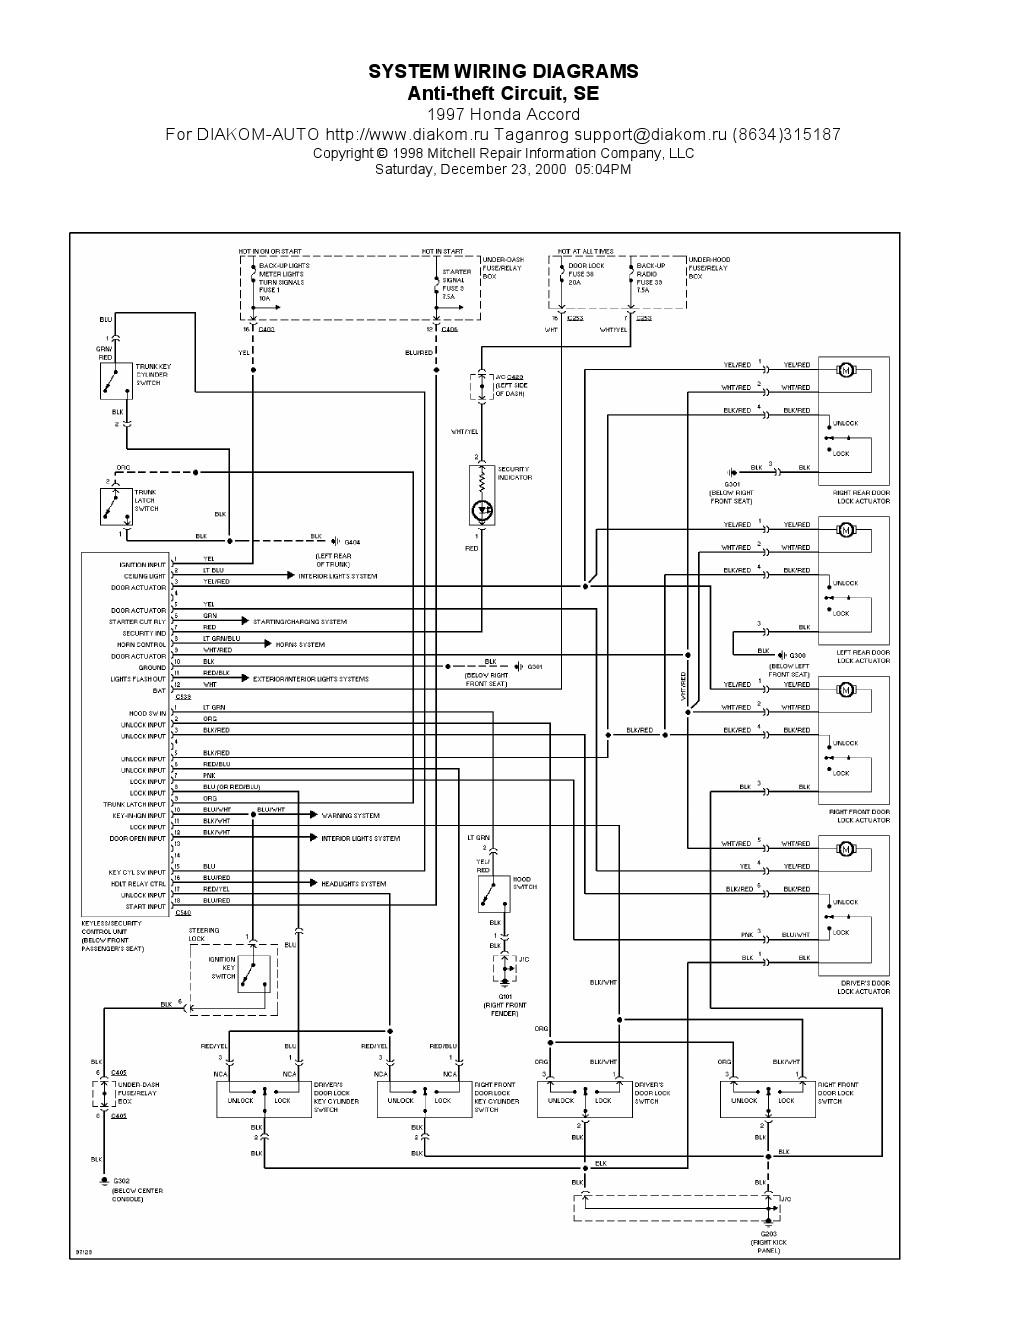 1997 Honda Accord Antitheft Circuit SE, System Wiring